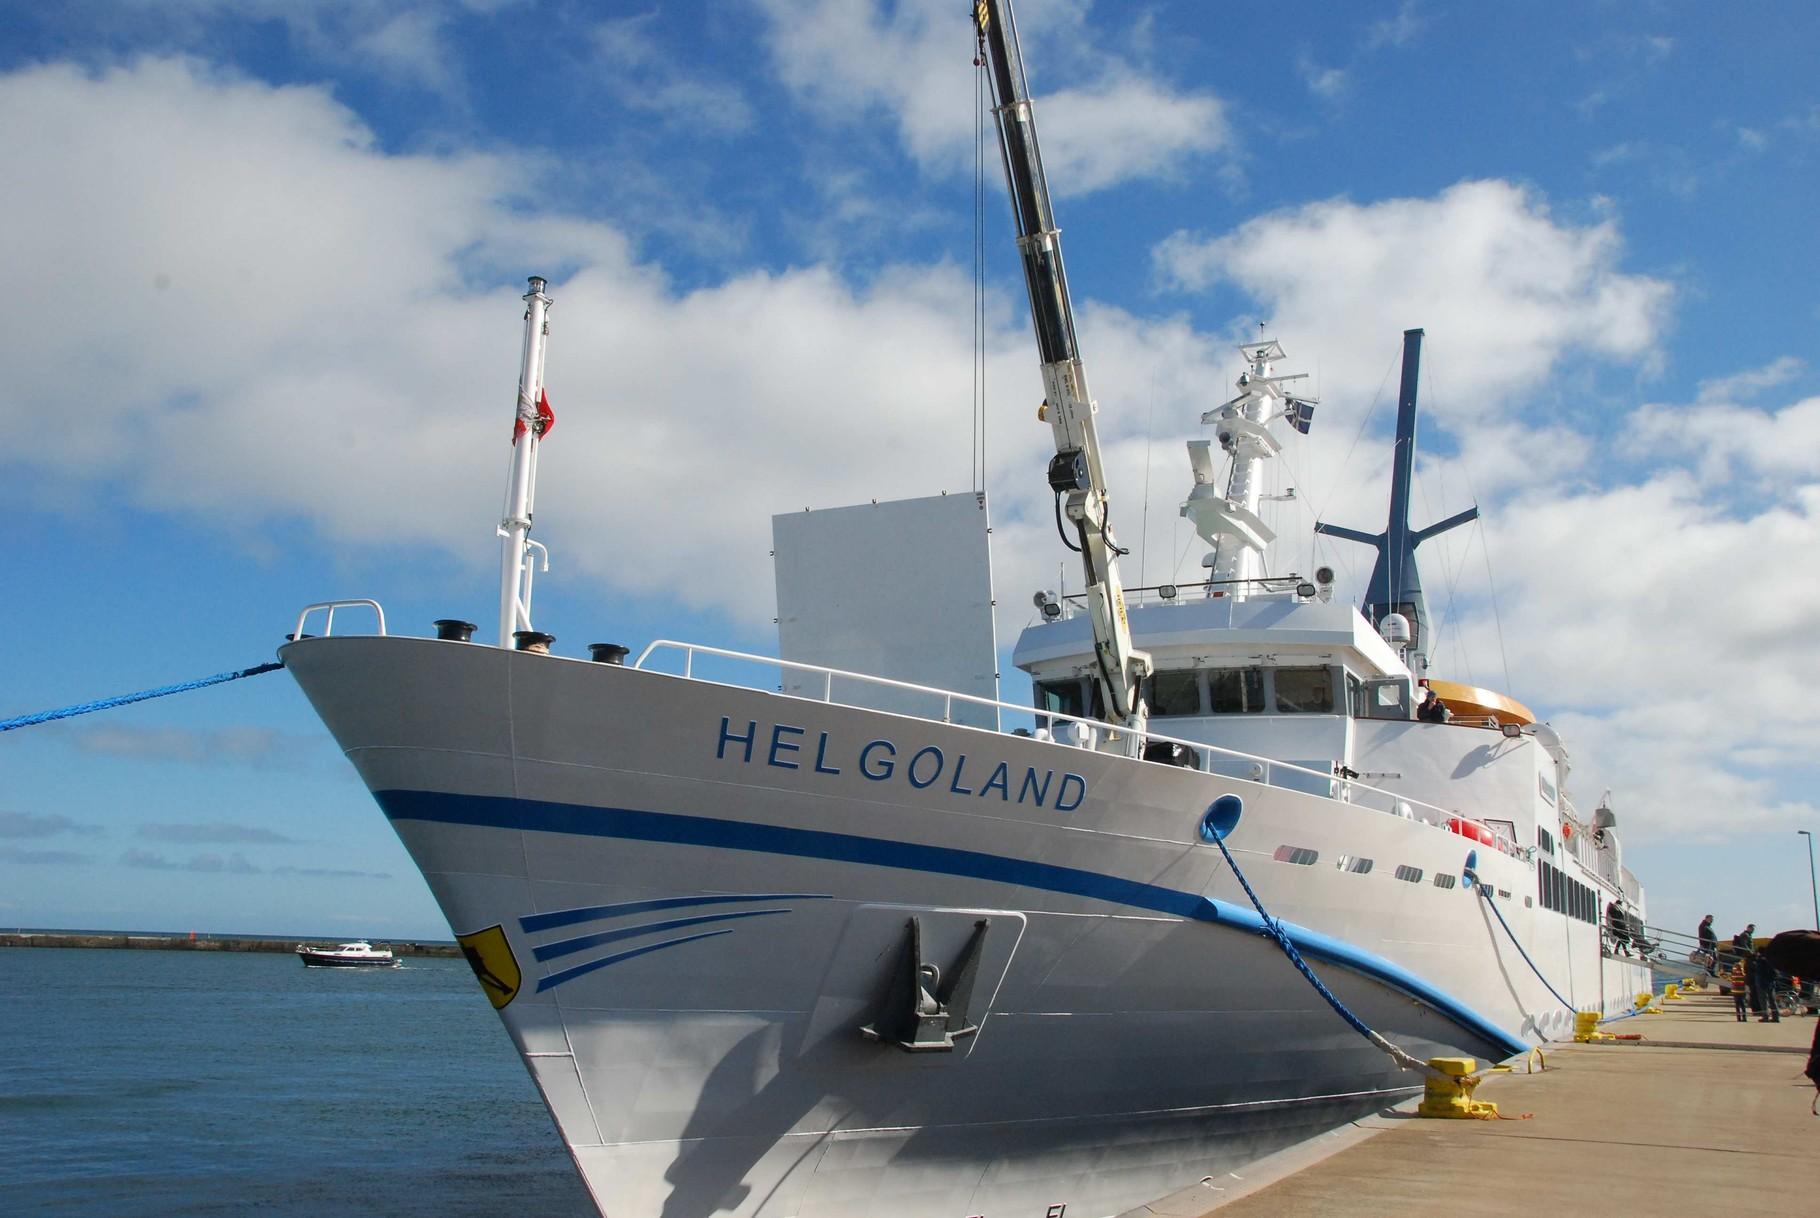 MS Helgoland